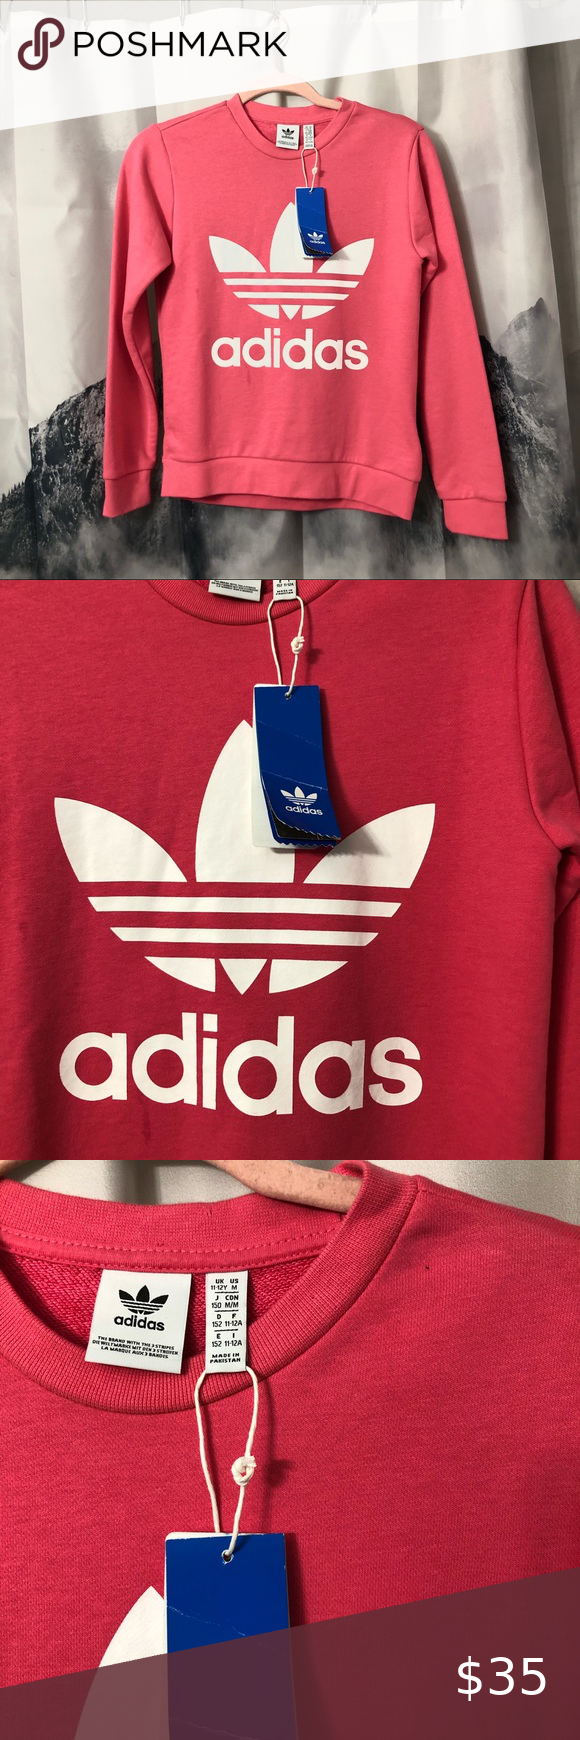 Adidas Trefoil Kids Pink Pullover Sz Med Cf 8570 Adidas Trefoil Pullover Adidas Shirt [ 1740 x 580 Pixel ]